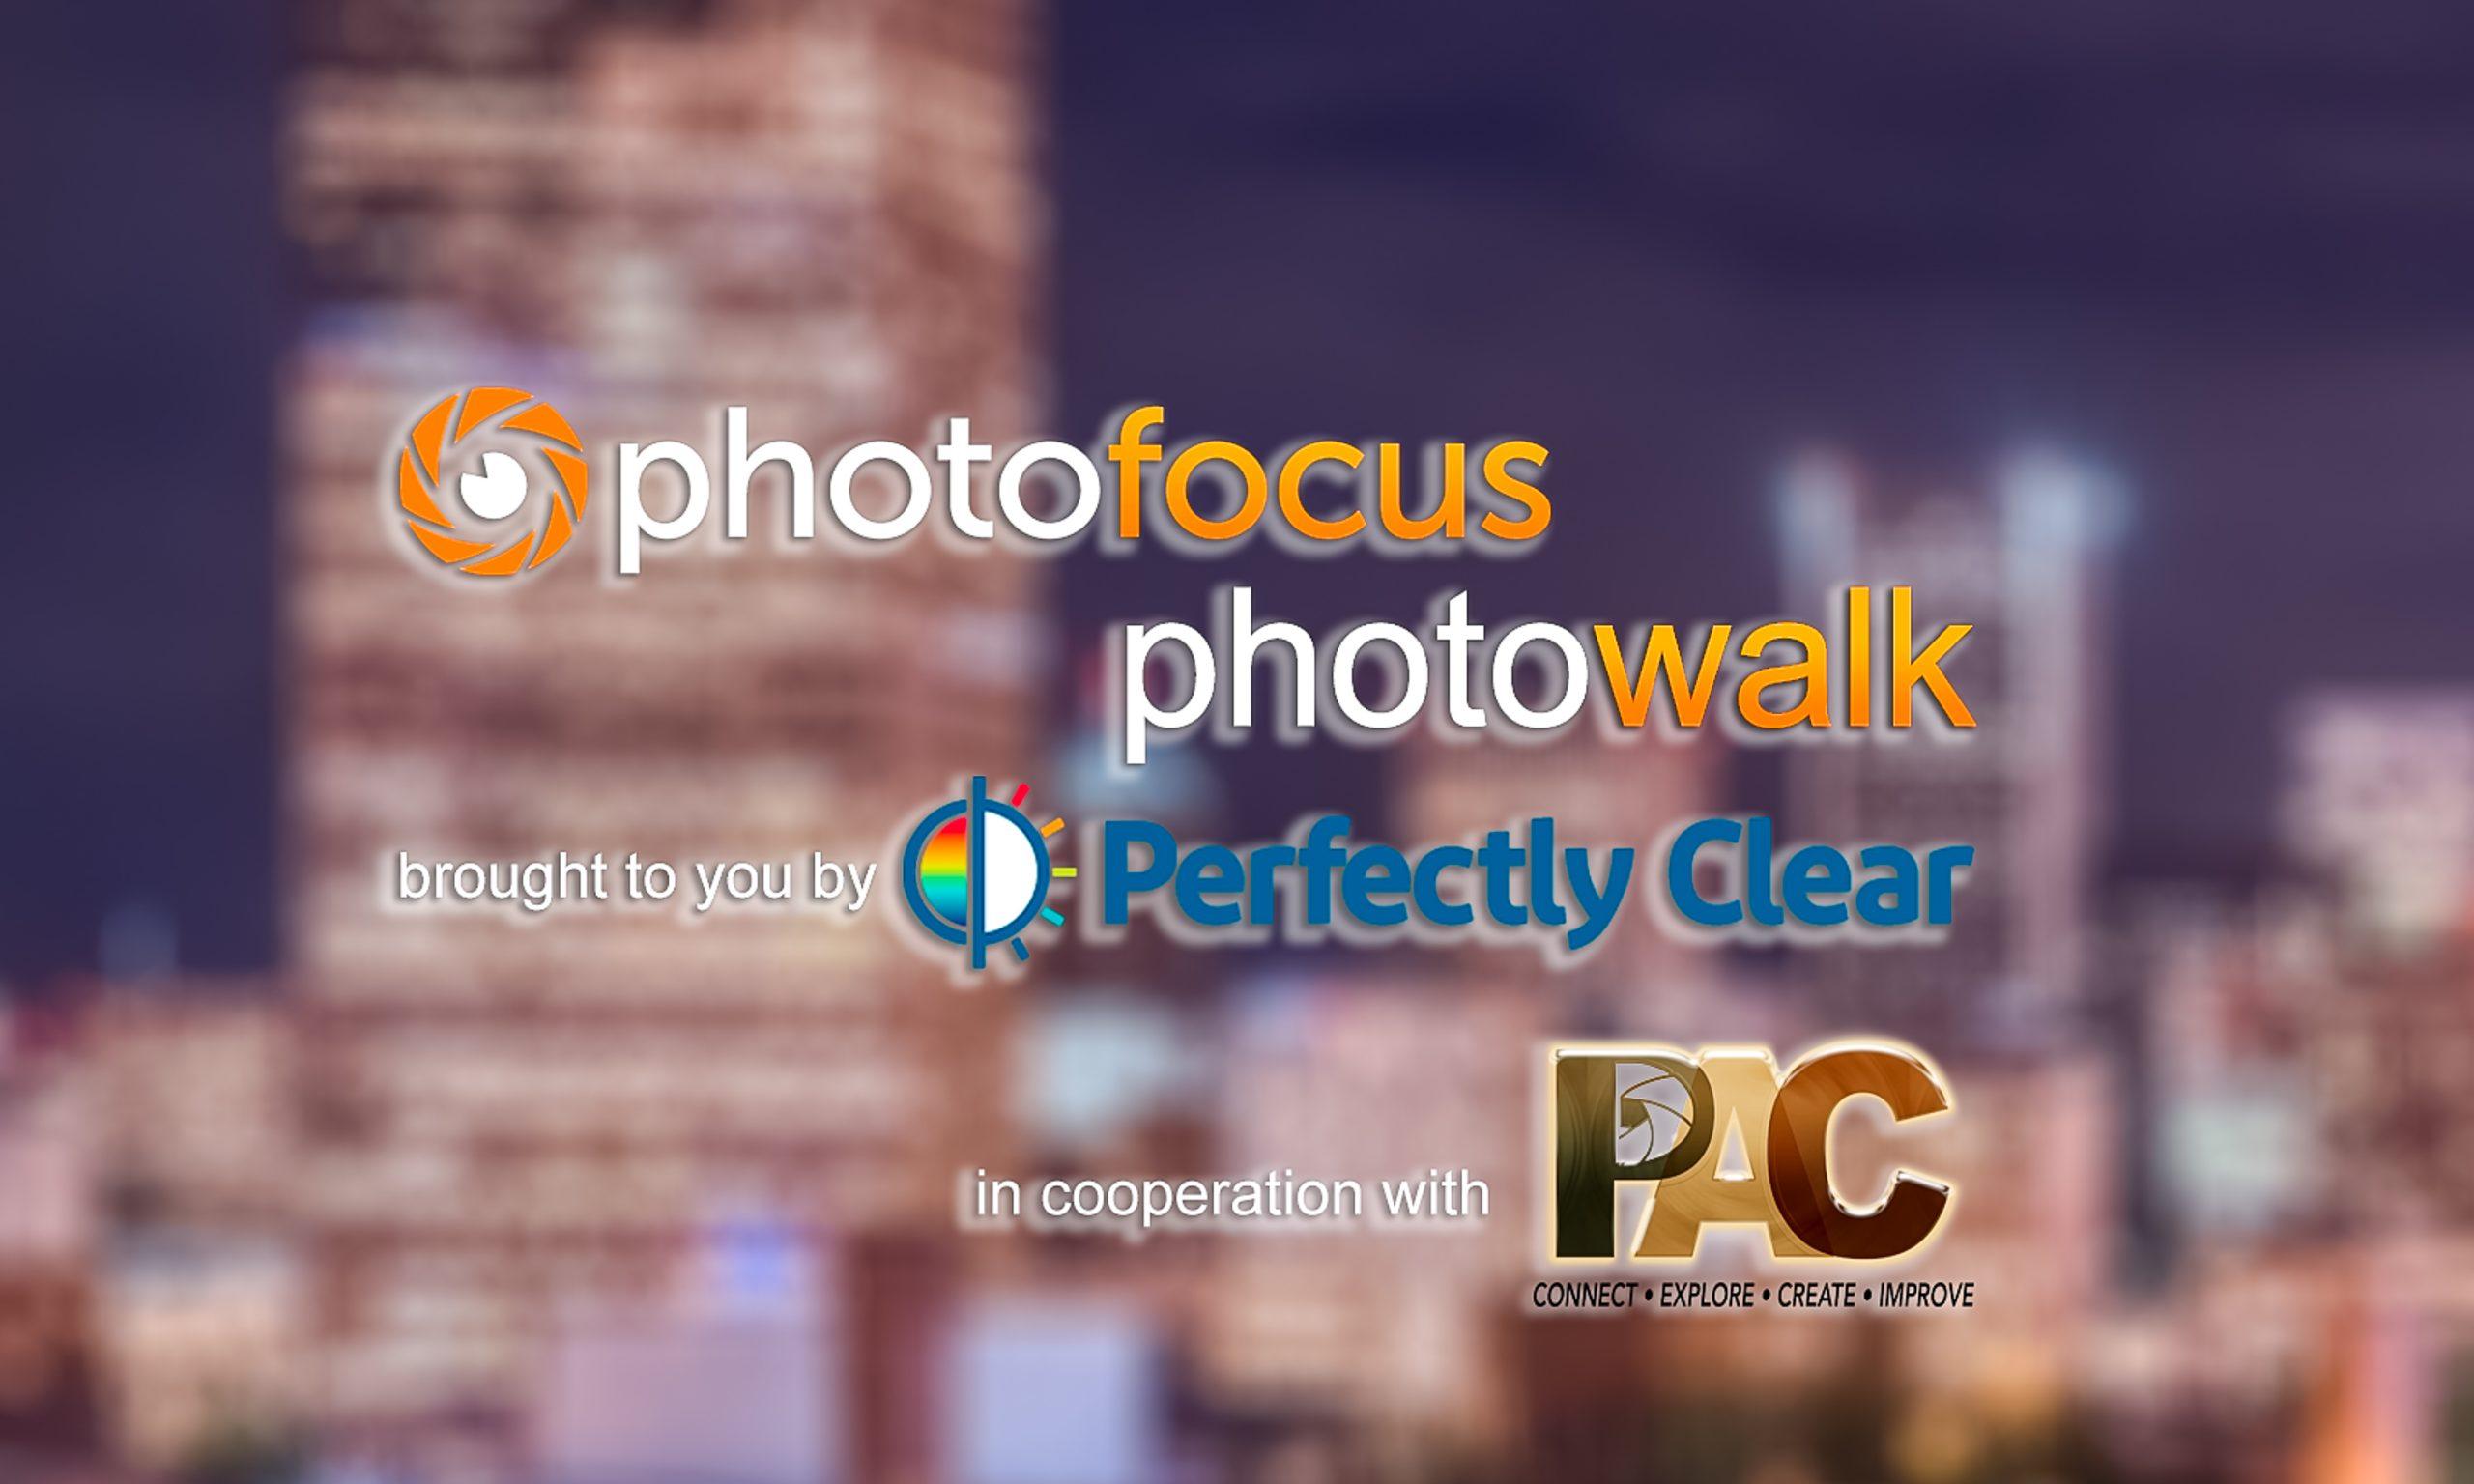 PhotofocusPhotowalk Cover City-1